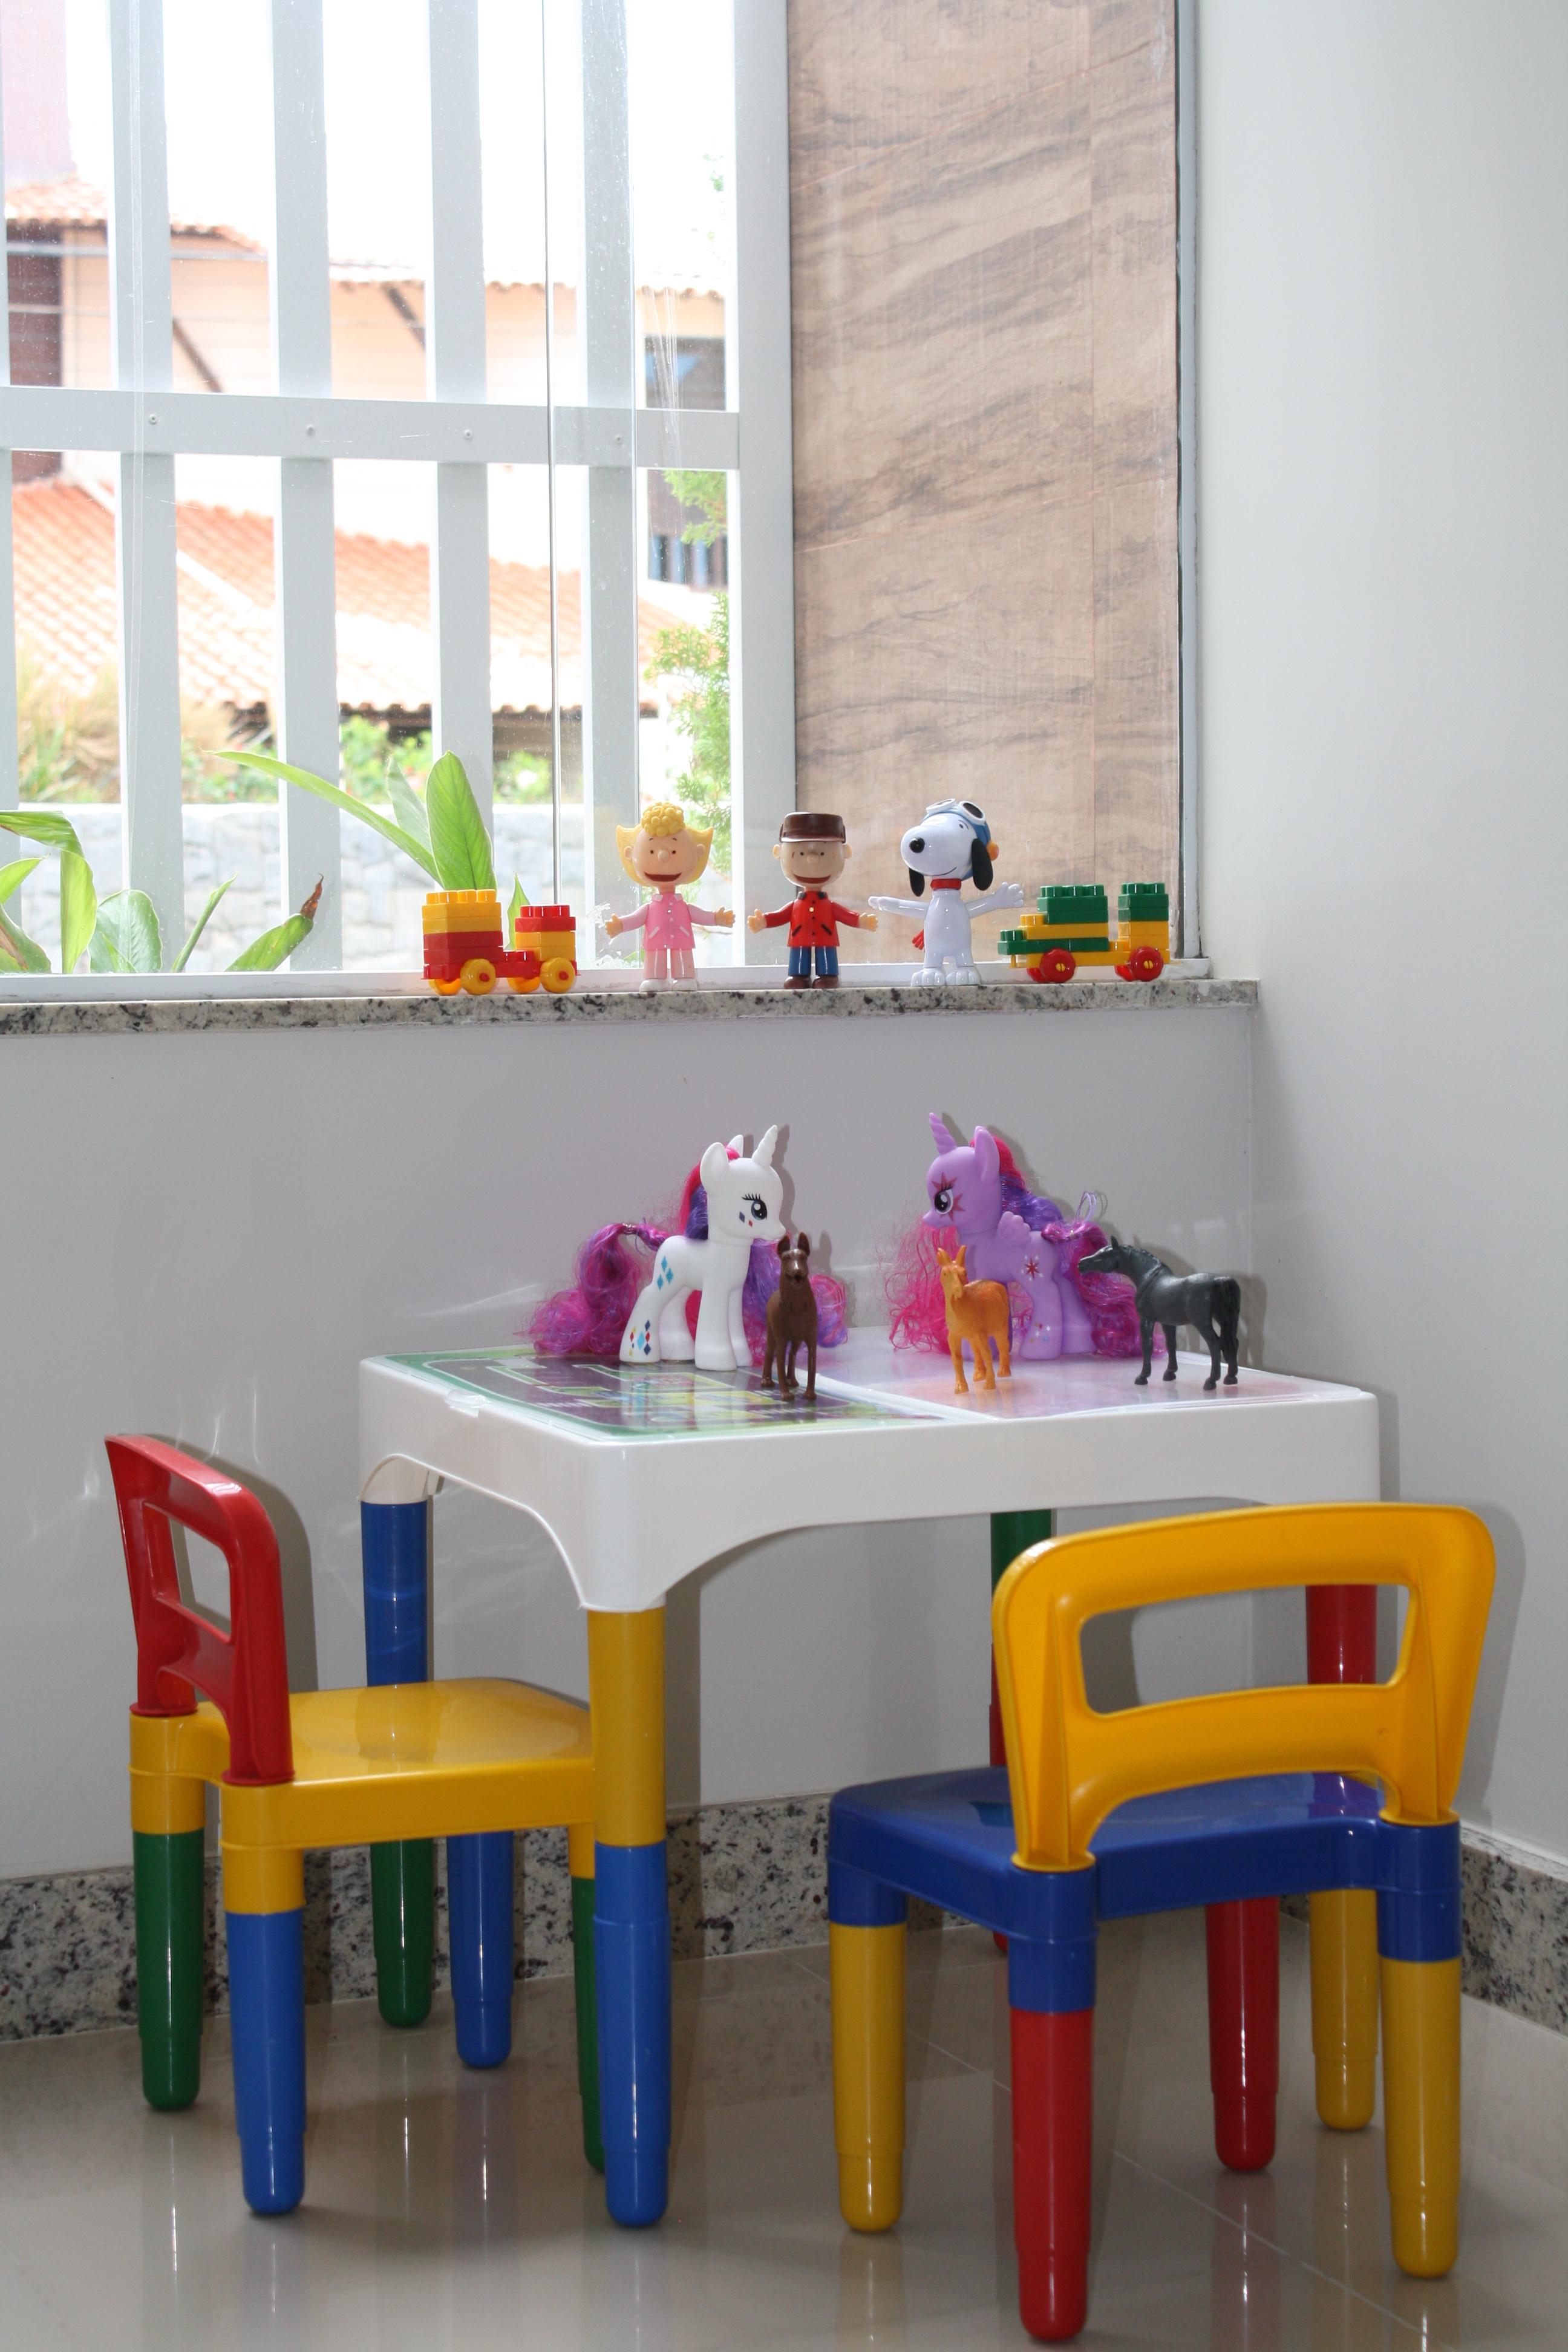 https://0201.nccdn.net/1_2/000/000/169/236/sala-infantil-2592x3888.jpg